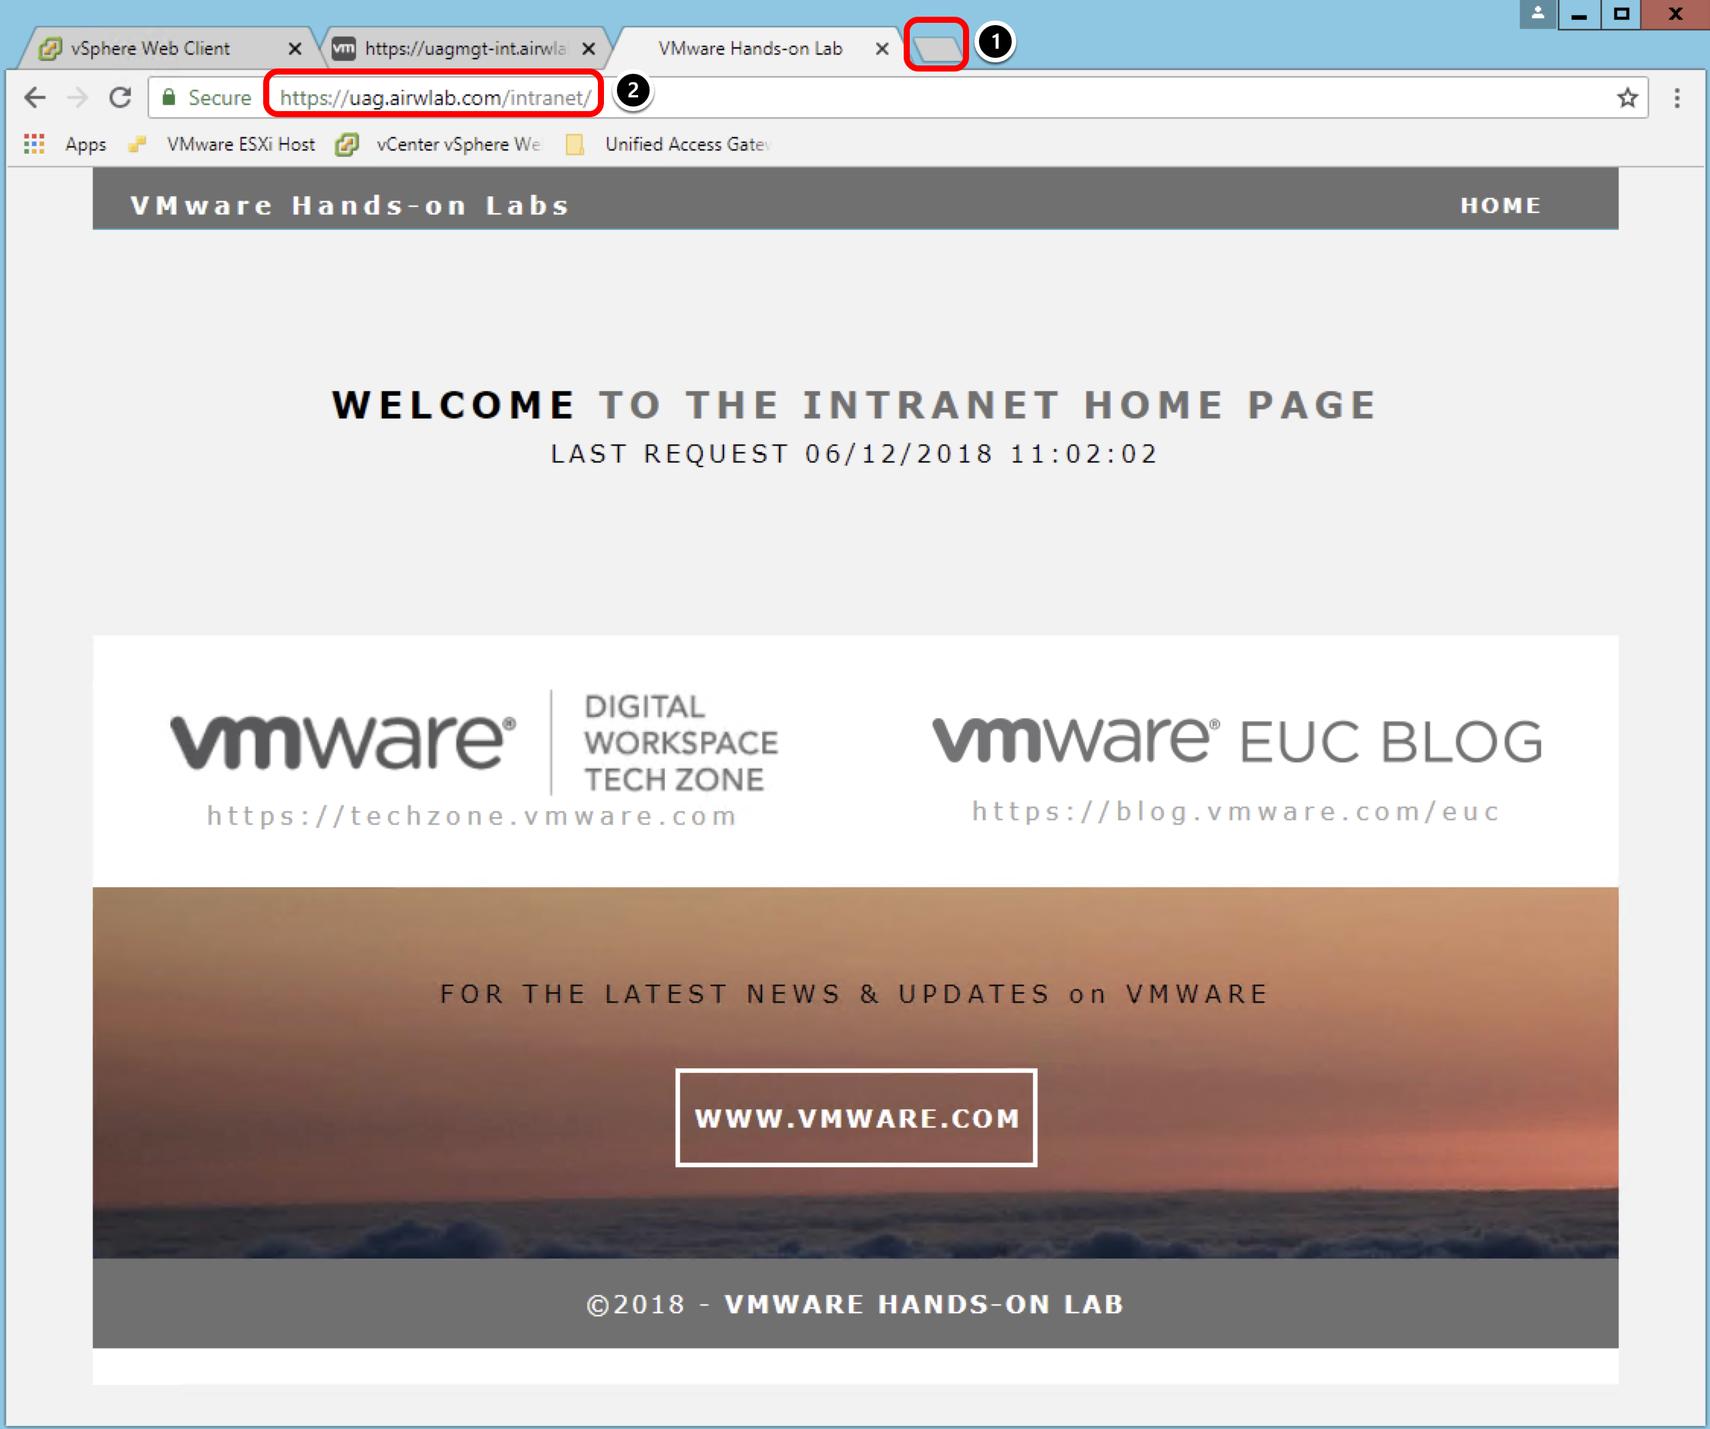 Intranet access through Reverse Proxy